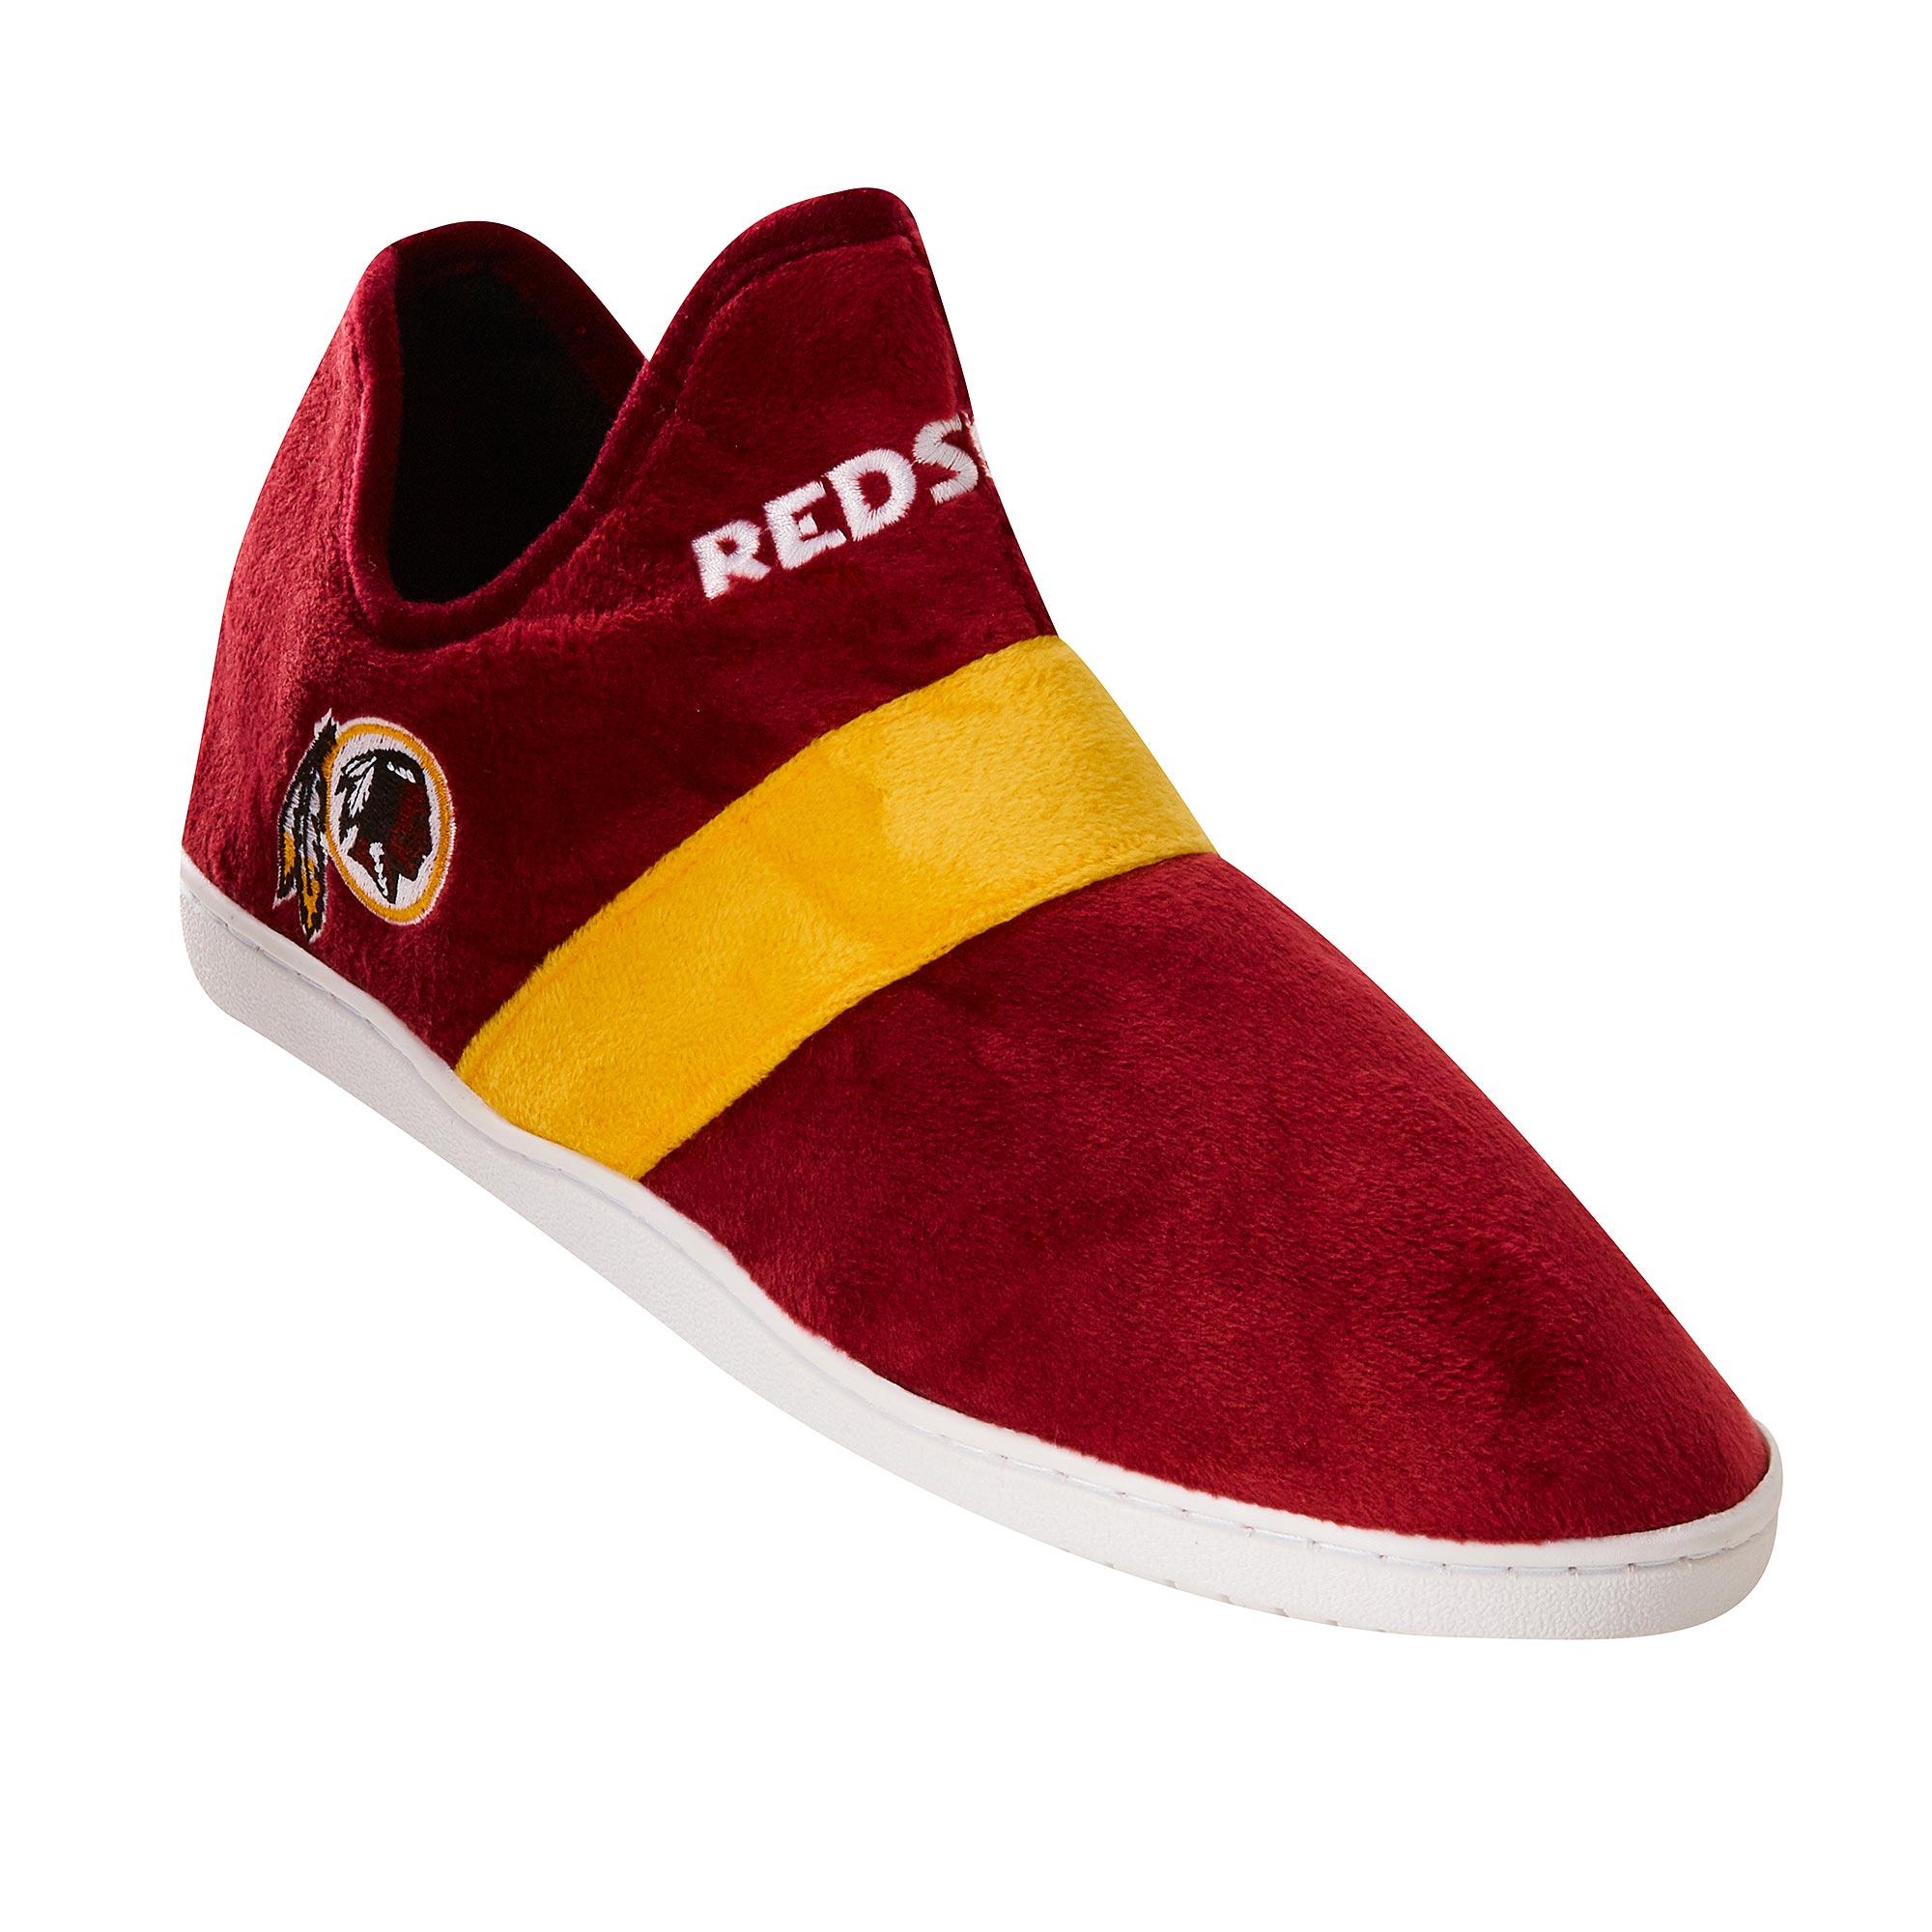 Washington Redskins Colorblock Sneakers mit TPR-Sohle